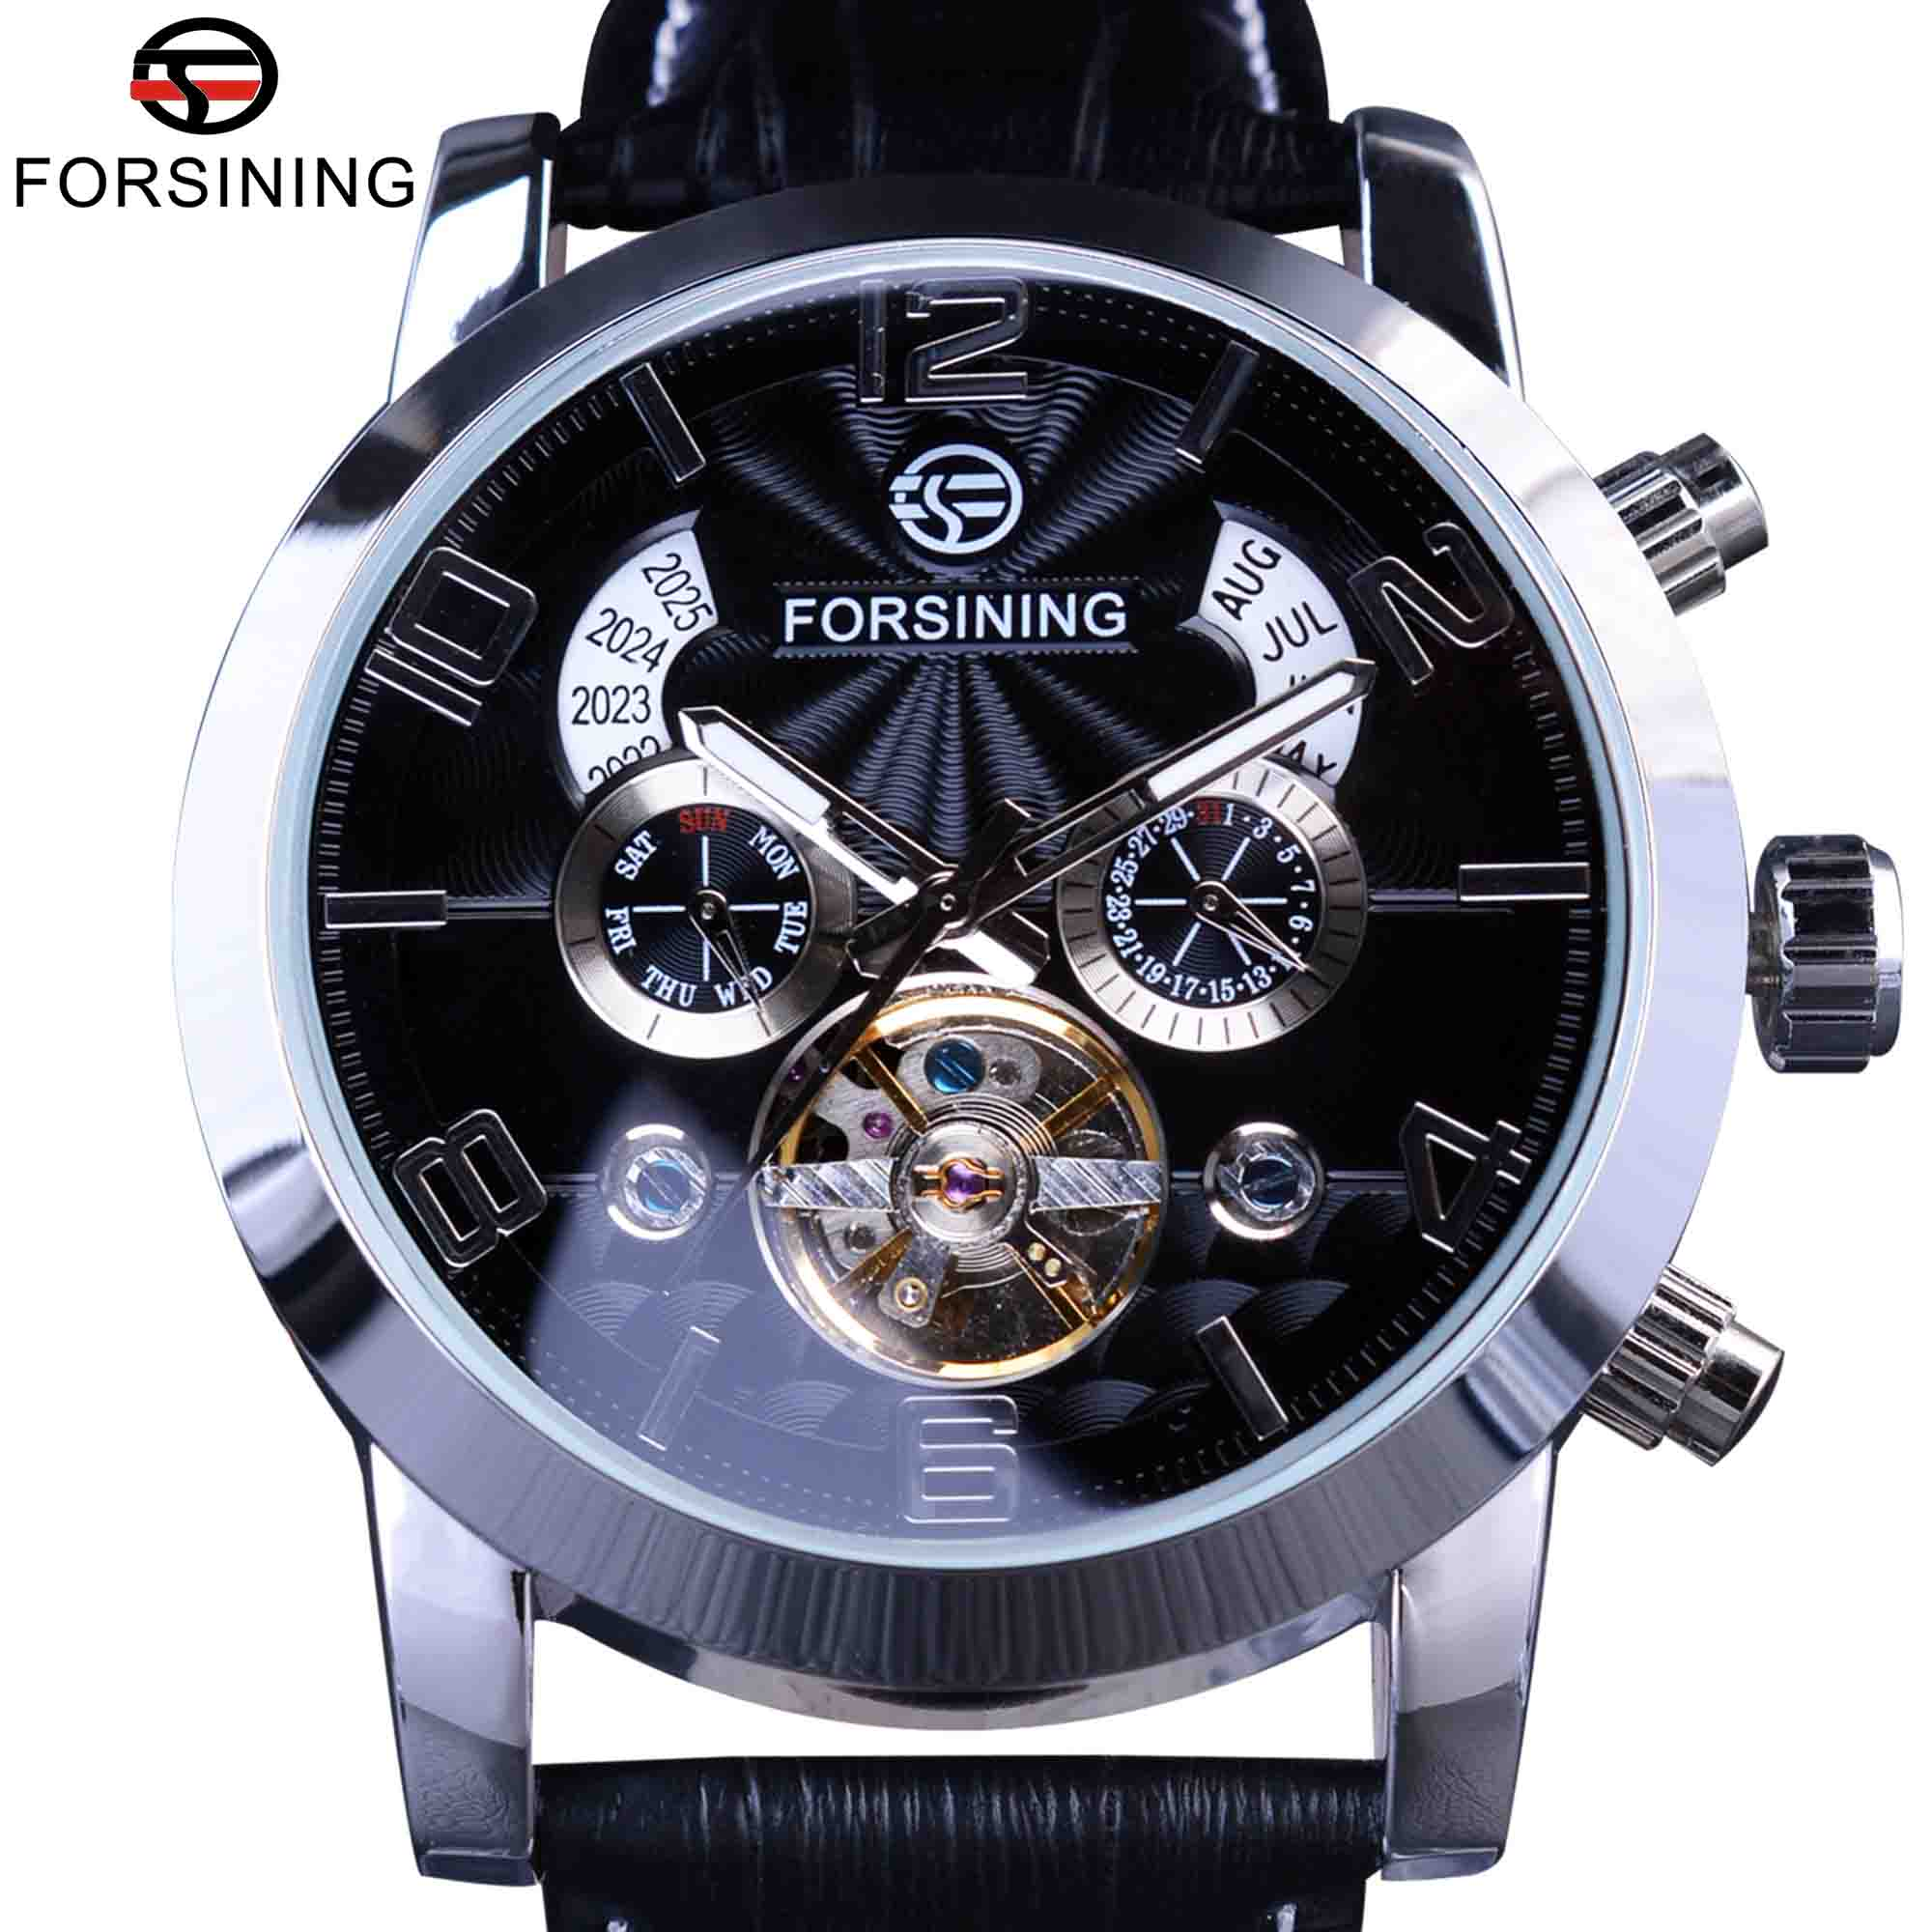 Forsining Tourbillion Fashion Wave Dial Design Multi Function Display Men Automatic Watch Top Brand Luxury Mechanical Wristwatch